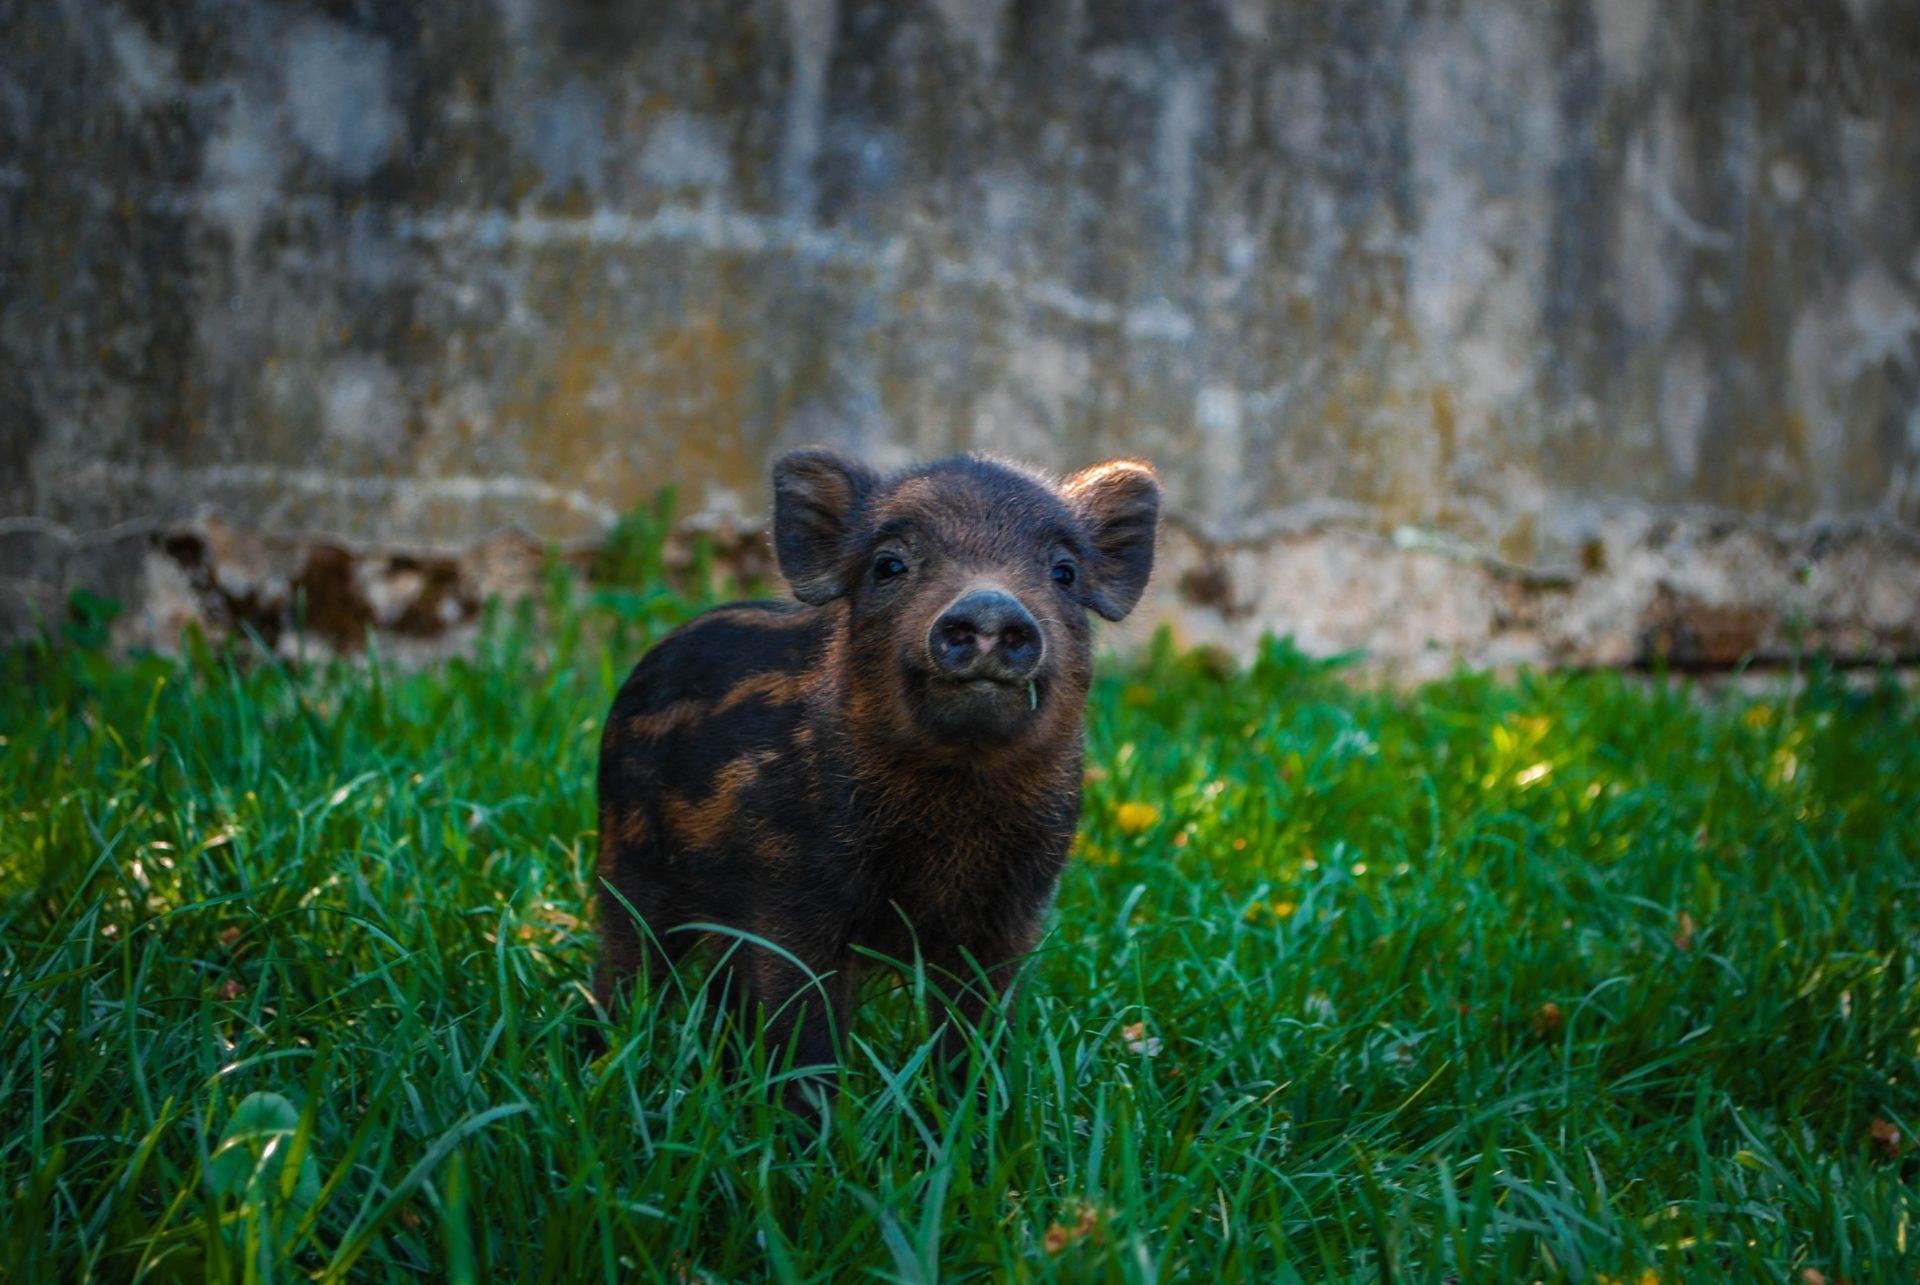 Abandono animales exóticos 2 cerdo abandonado